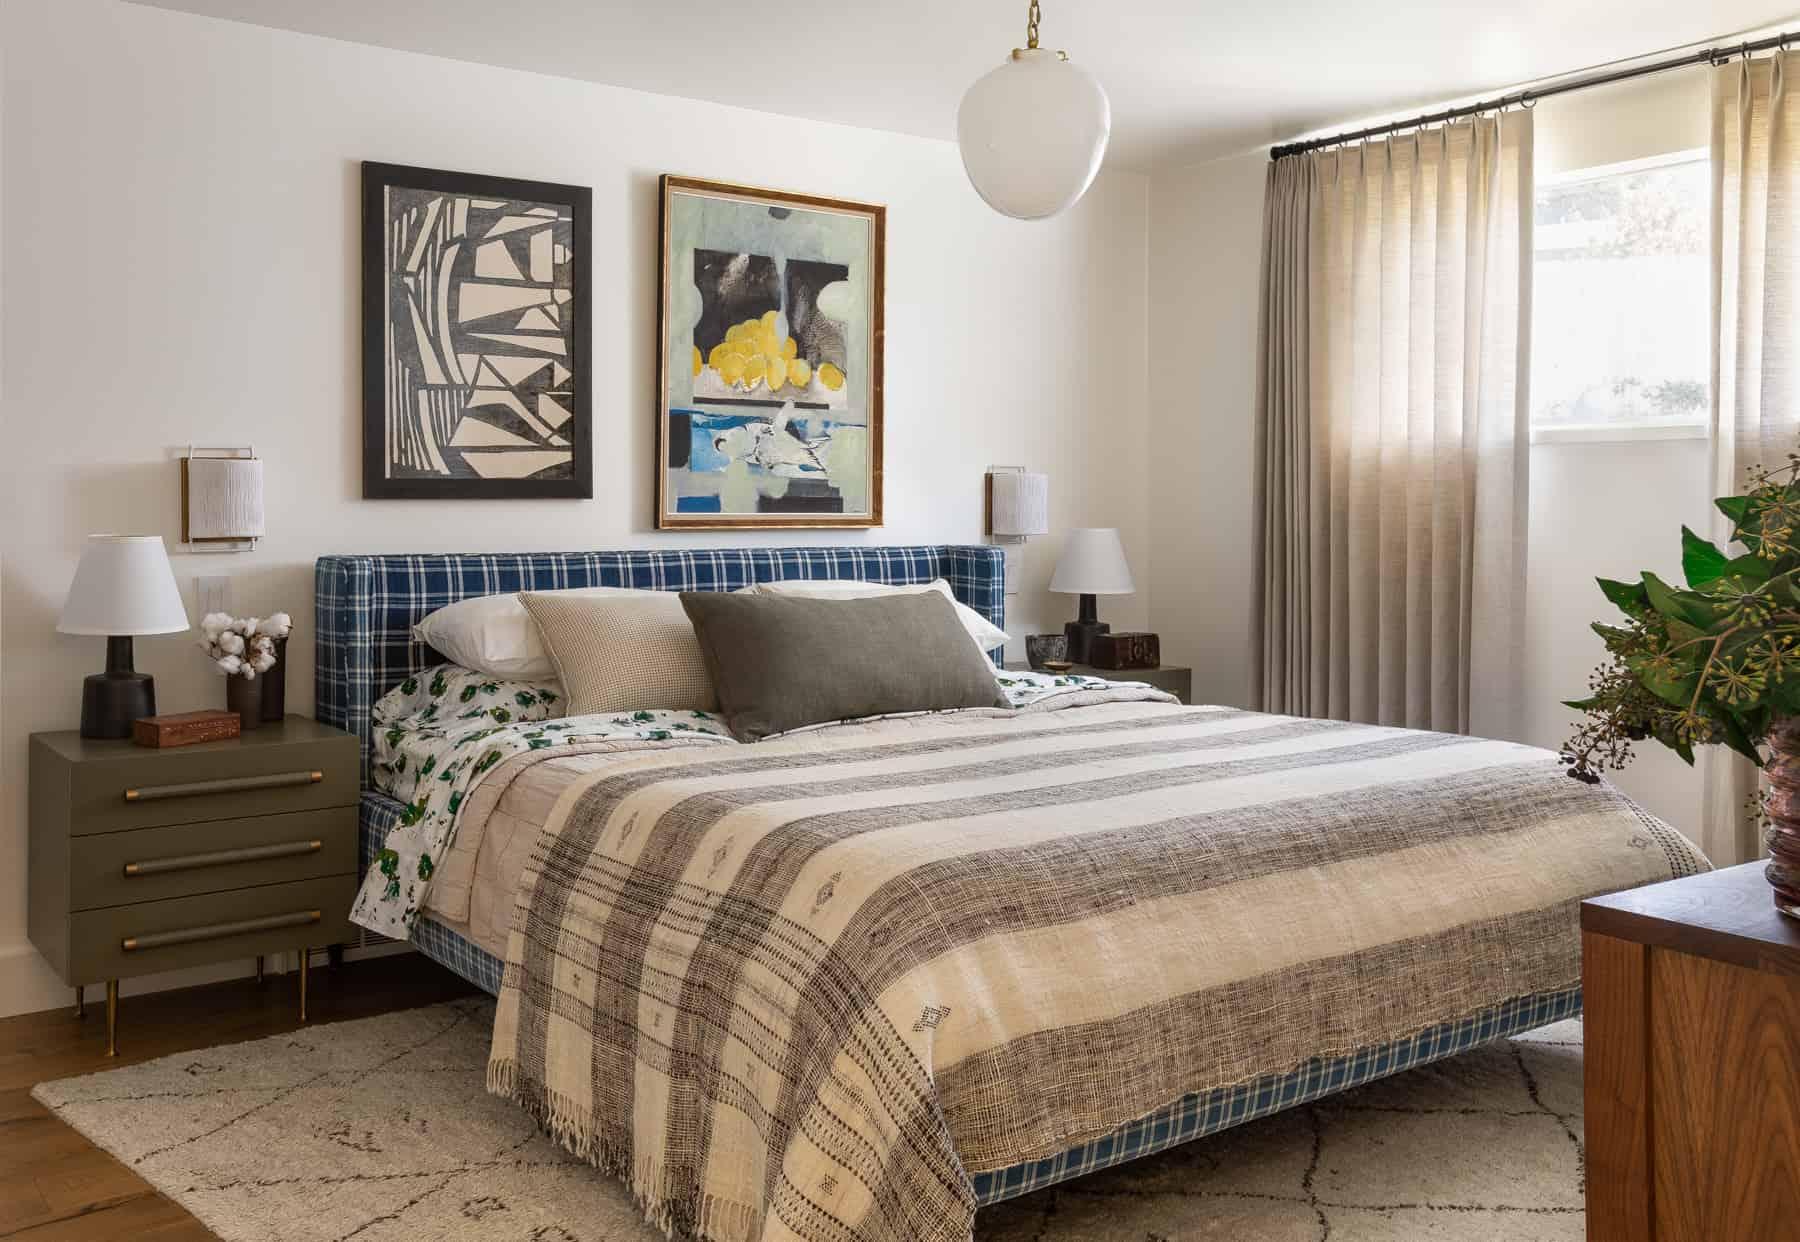 Heidi Caillier Design Seattle Interior Designer Olympic Manor House